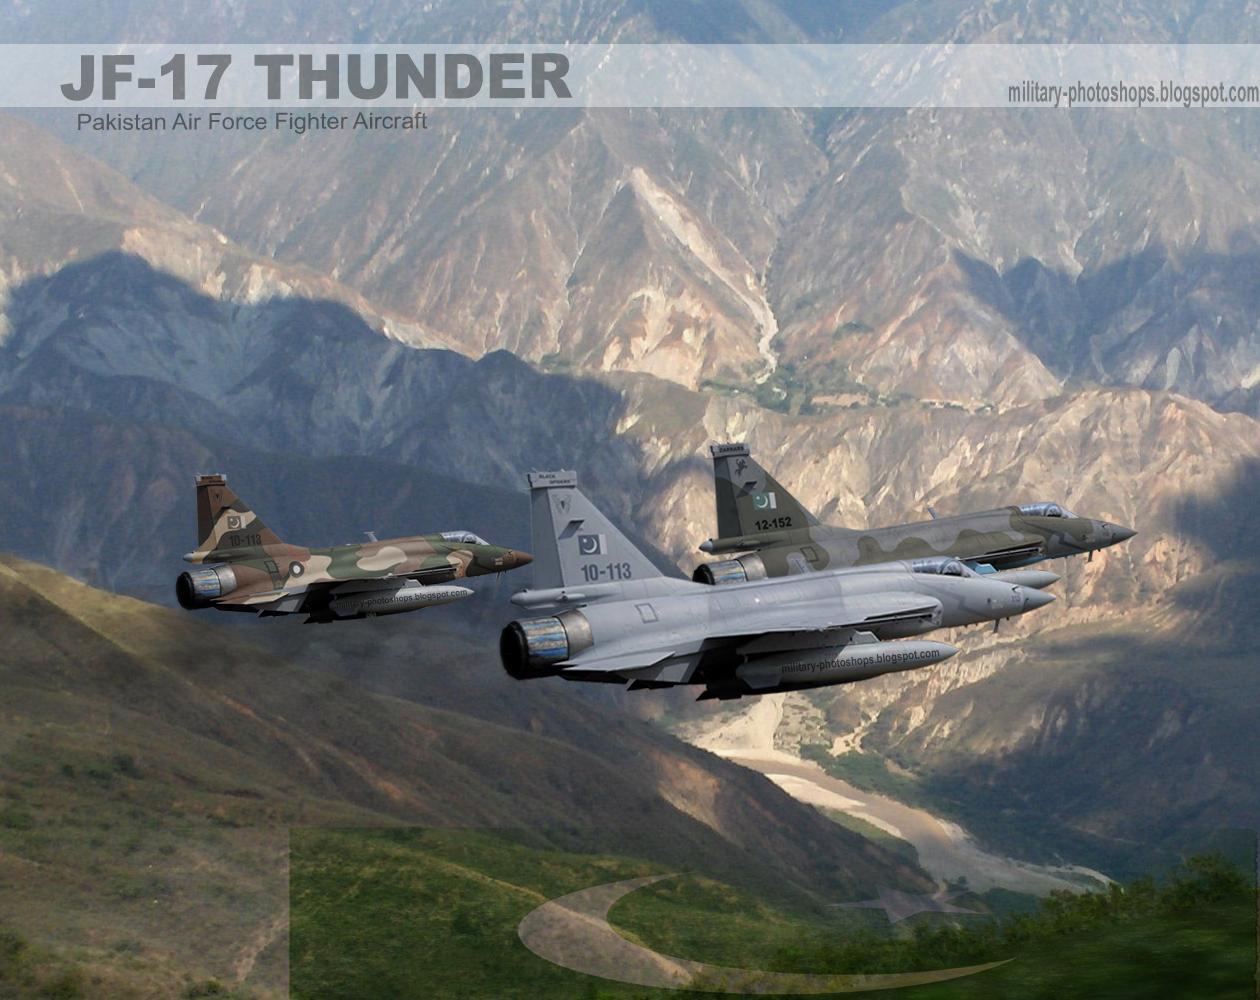 Photoshops Pakistan Air Force JF 17 Thunder Wallpaper [HD] [1024x768 1260x1000